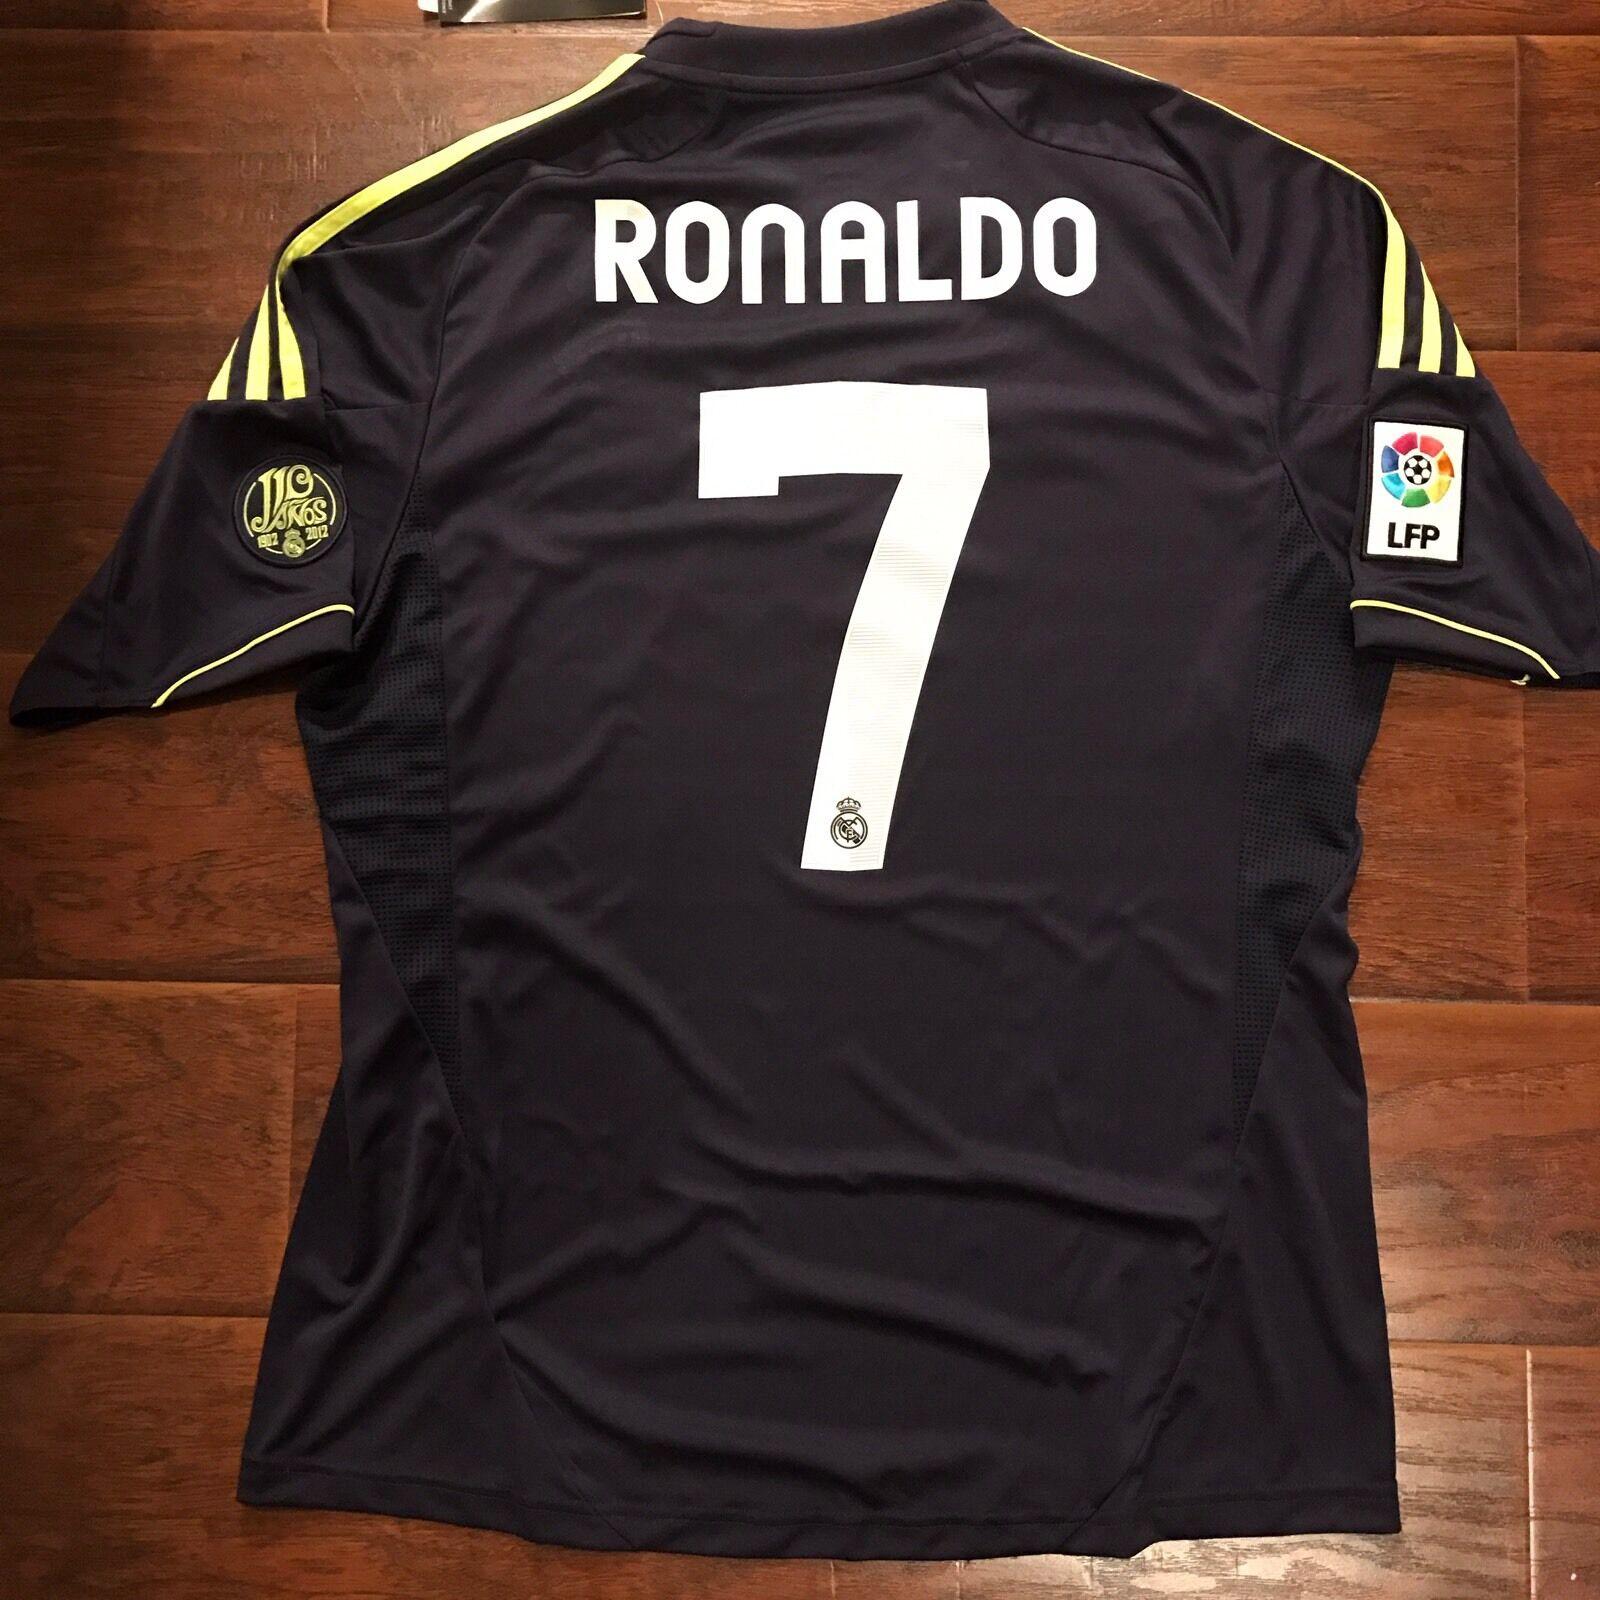 2012 13 Real Madrid Away Jersey Ronaldo Large Adidas Football Soccer NEW